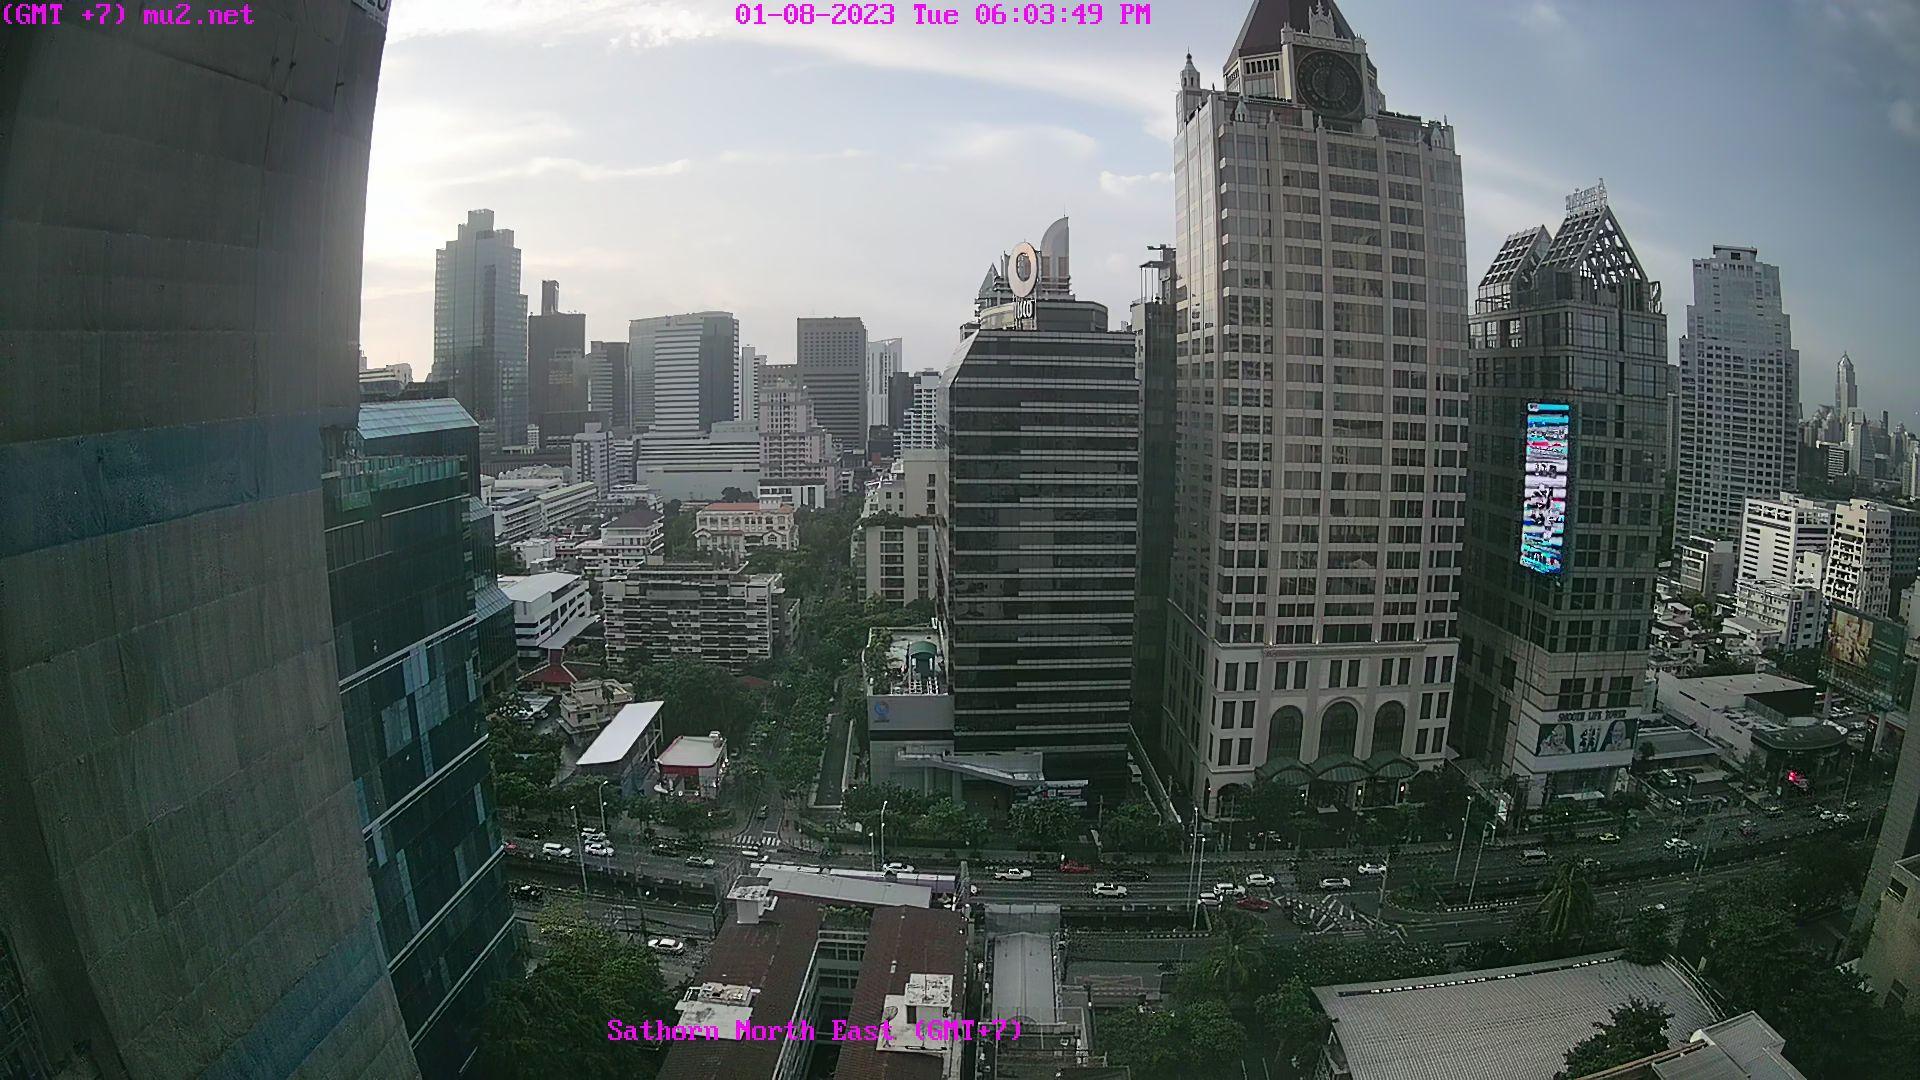 Bangkok Mon. 18:09